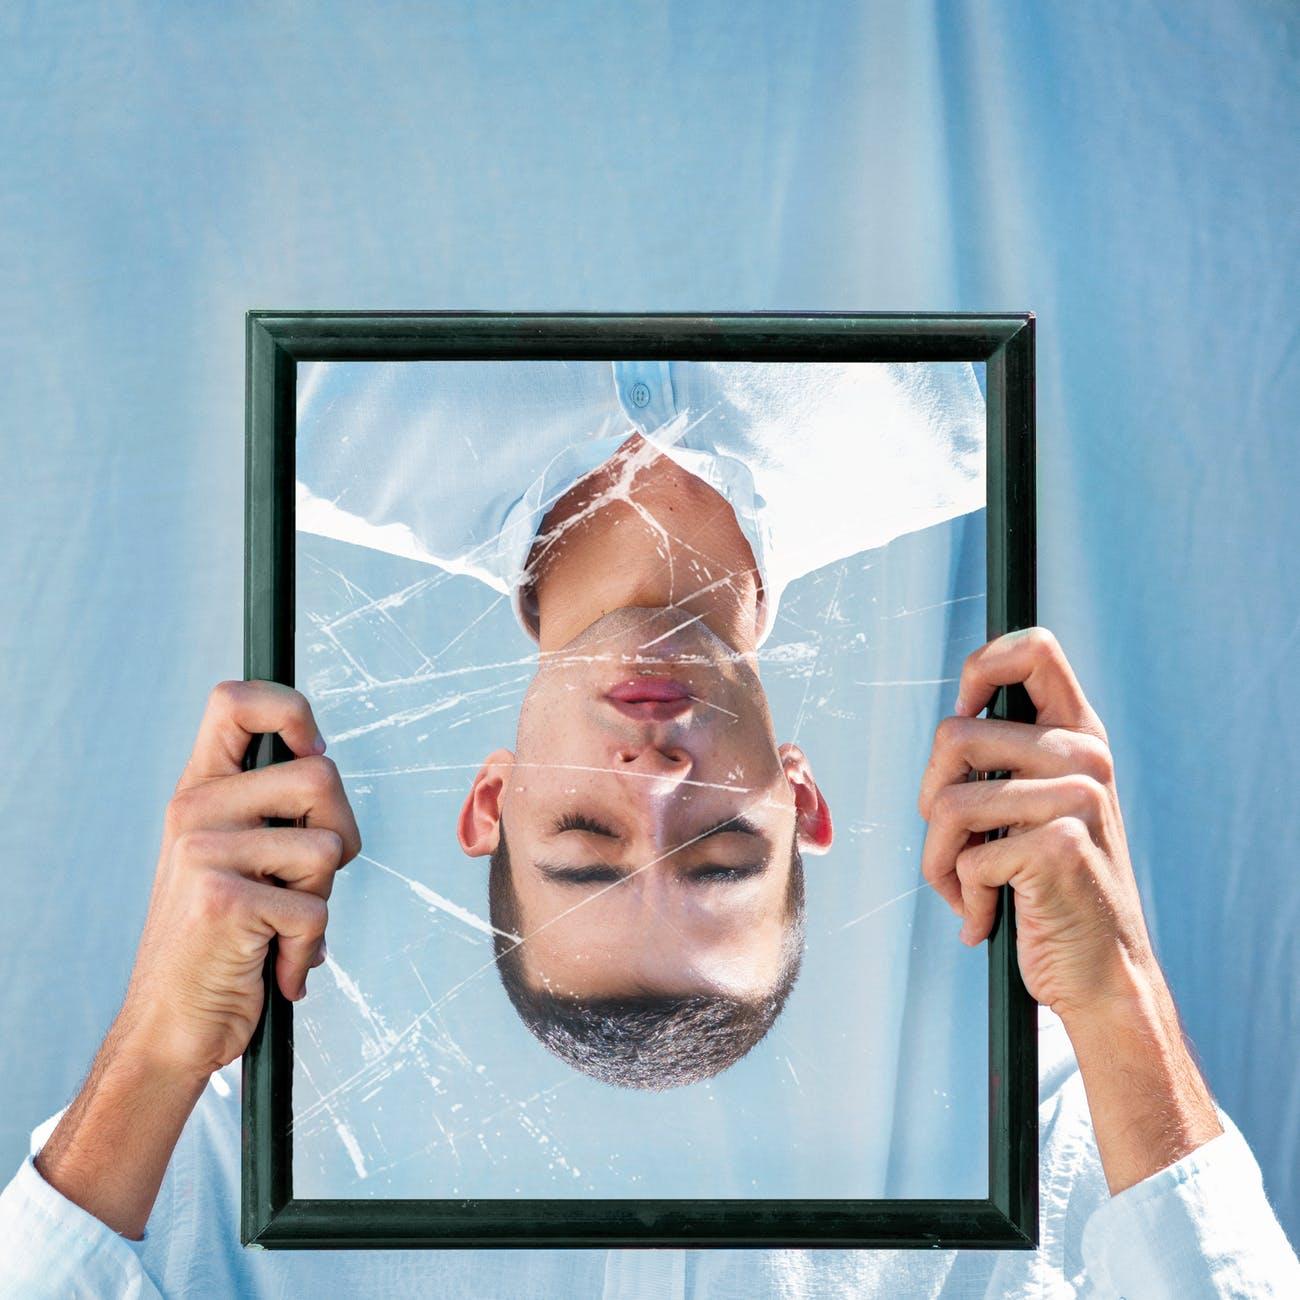 man closing his eyes reflection on mirror